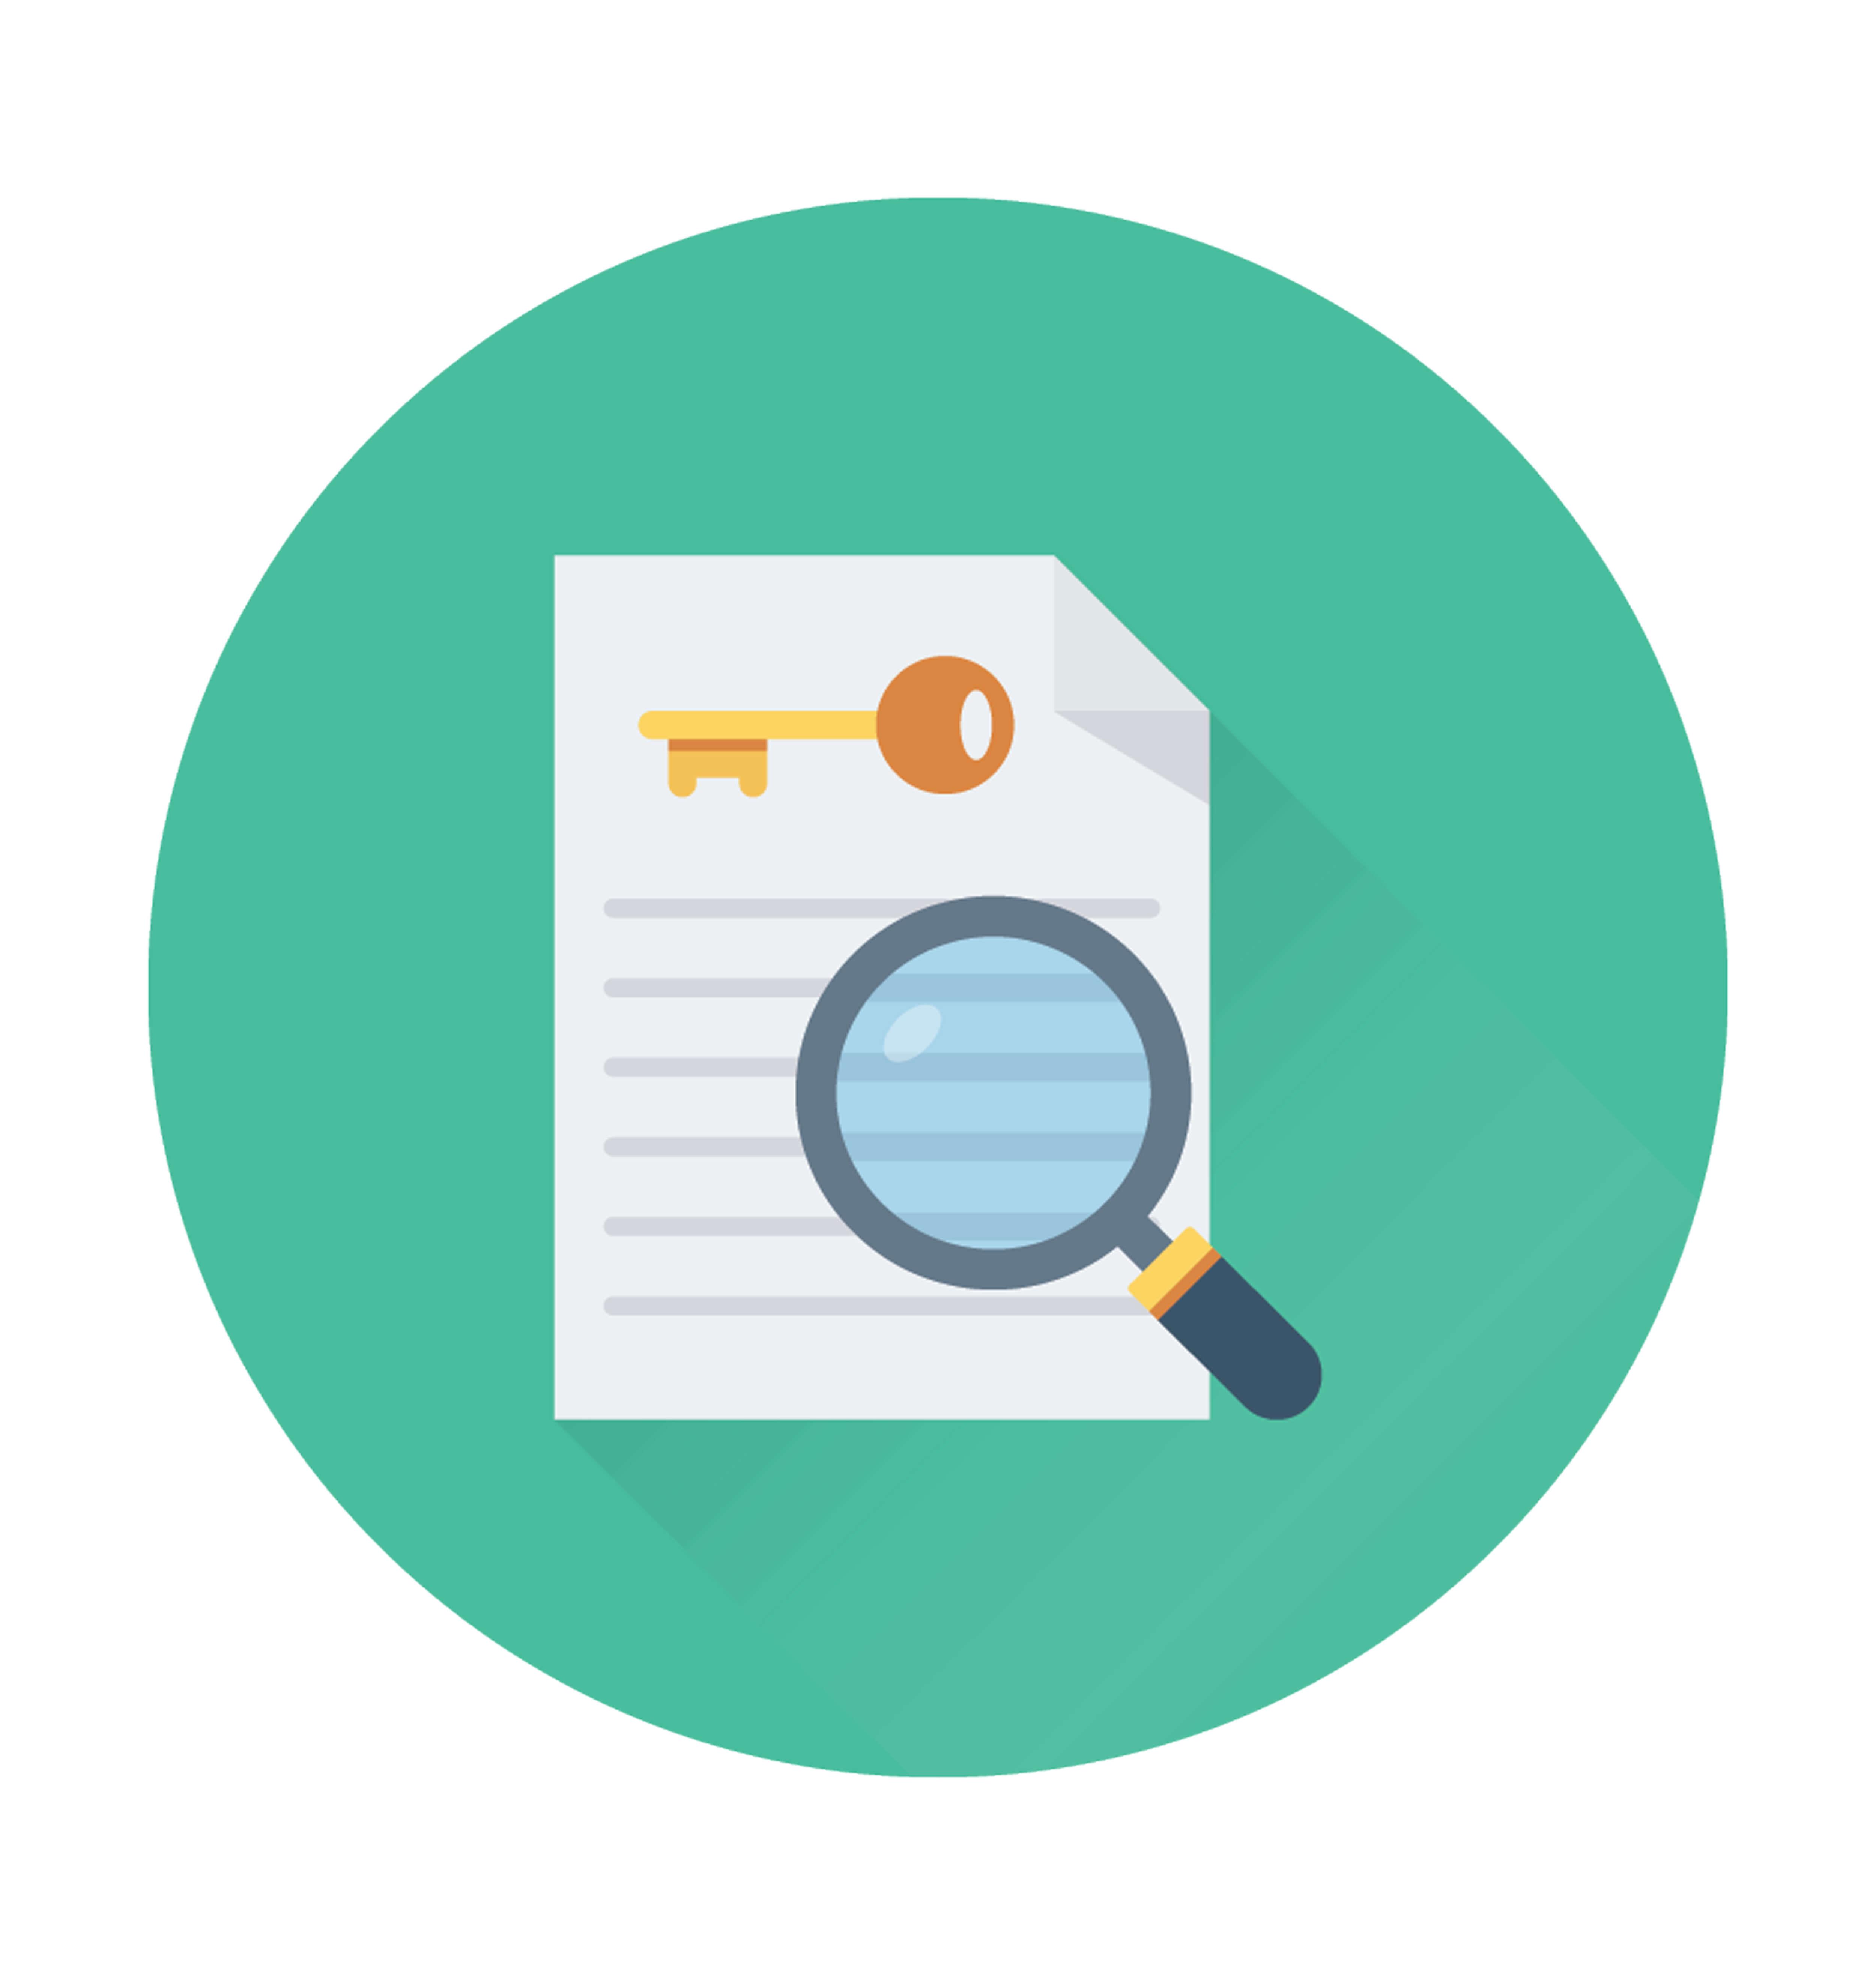 seo keyword optimization